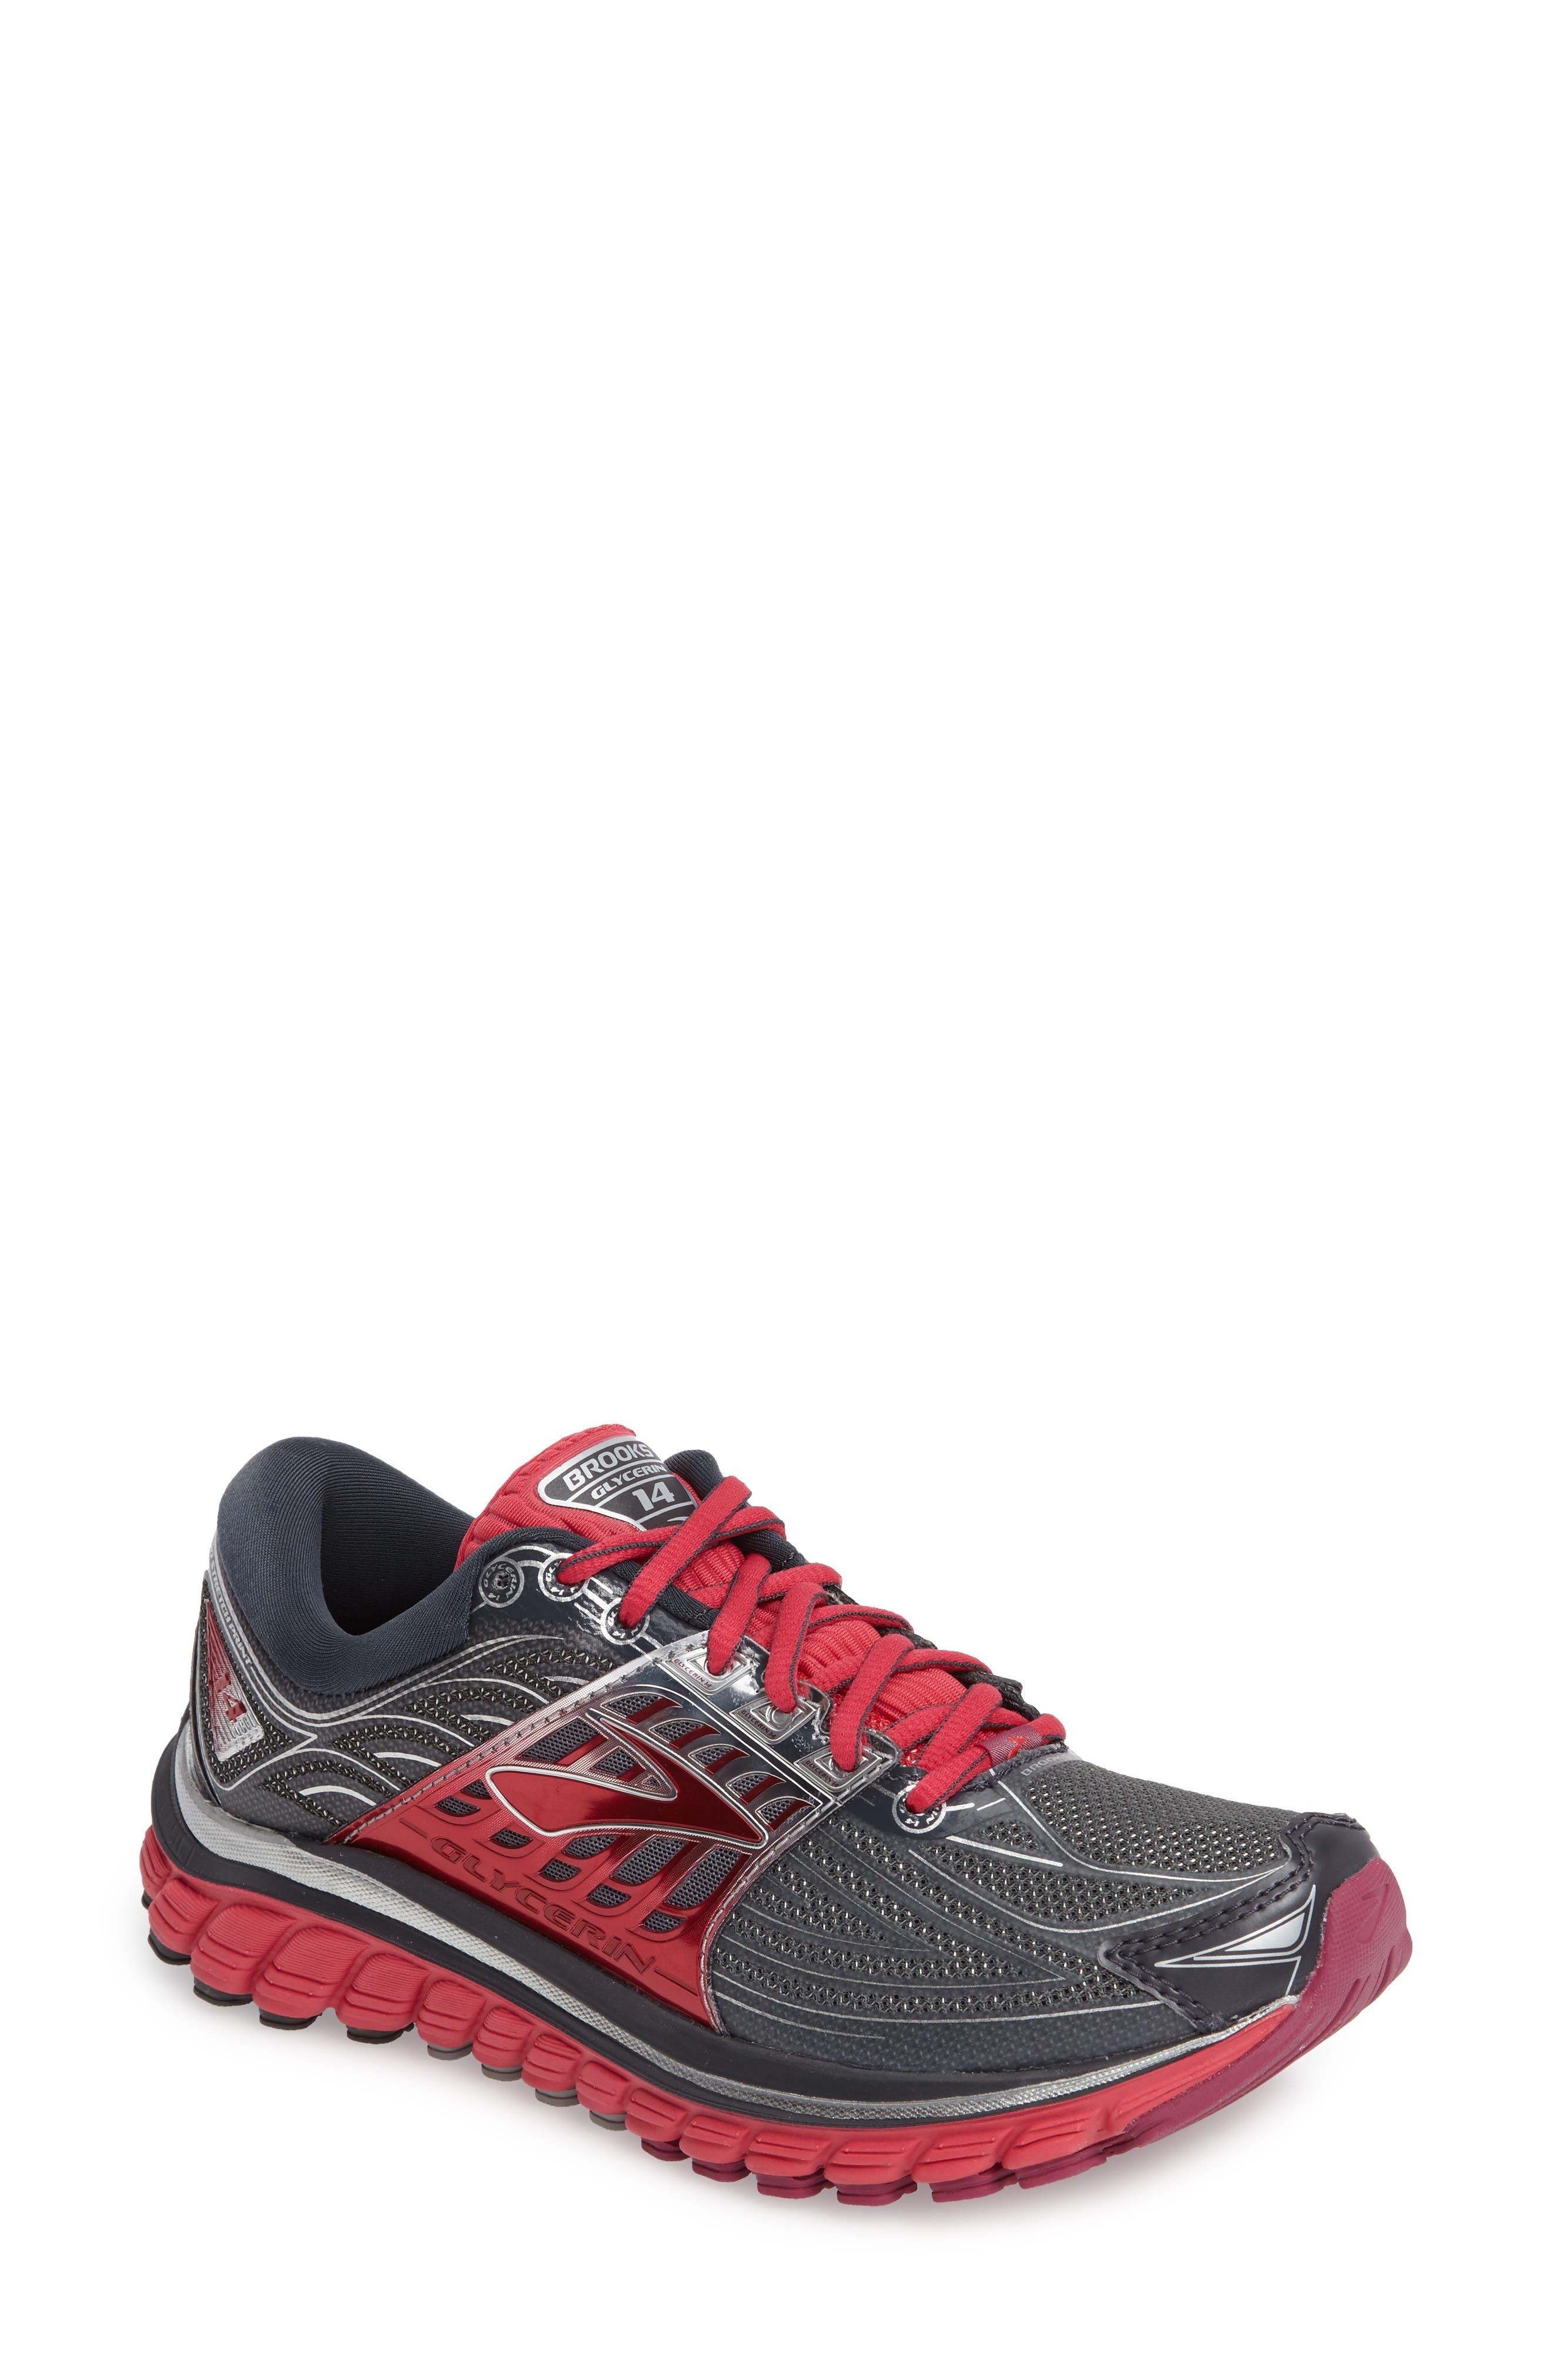 Alternate Image 1 Selected - Brooks 'Glycerin 14' Running Shoe (Women)